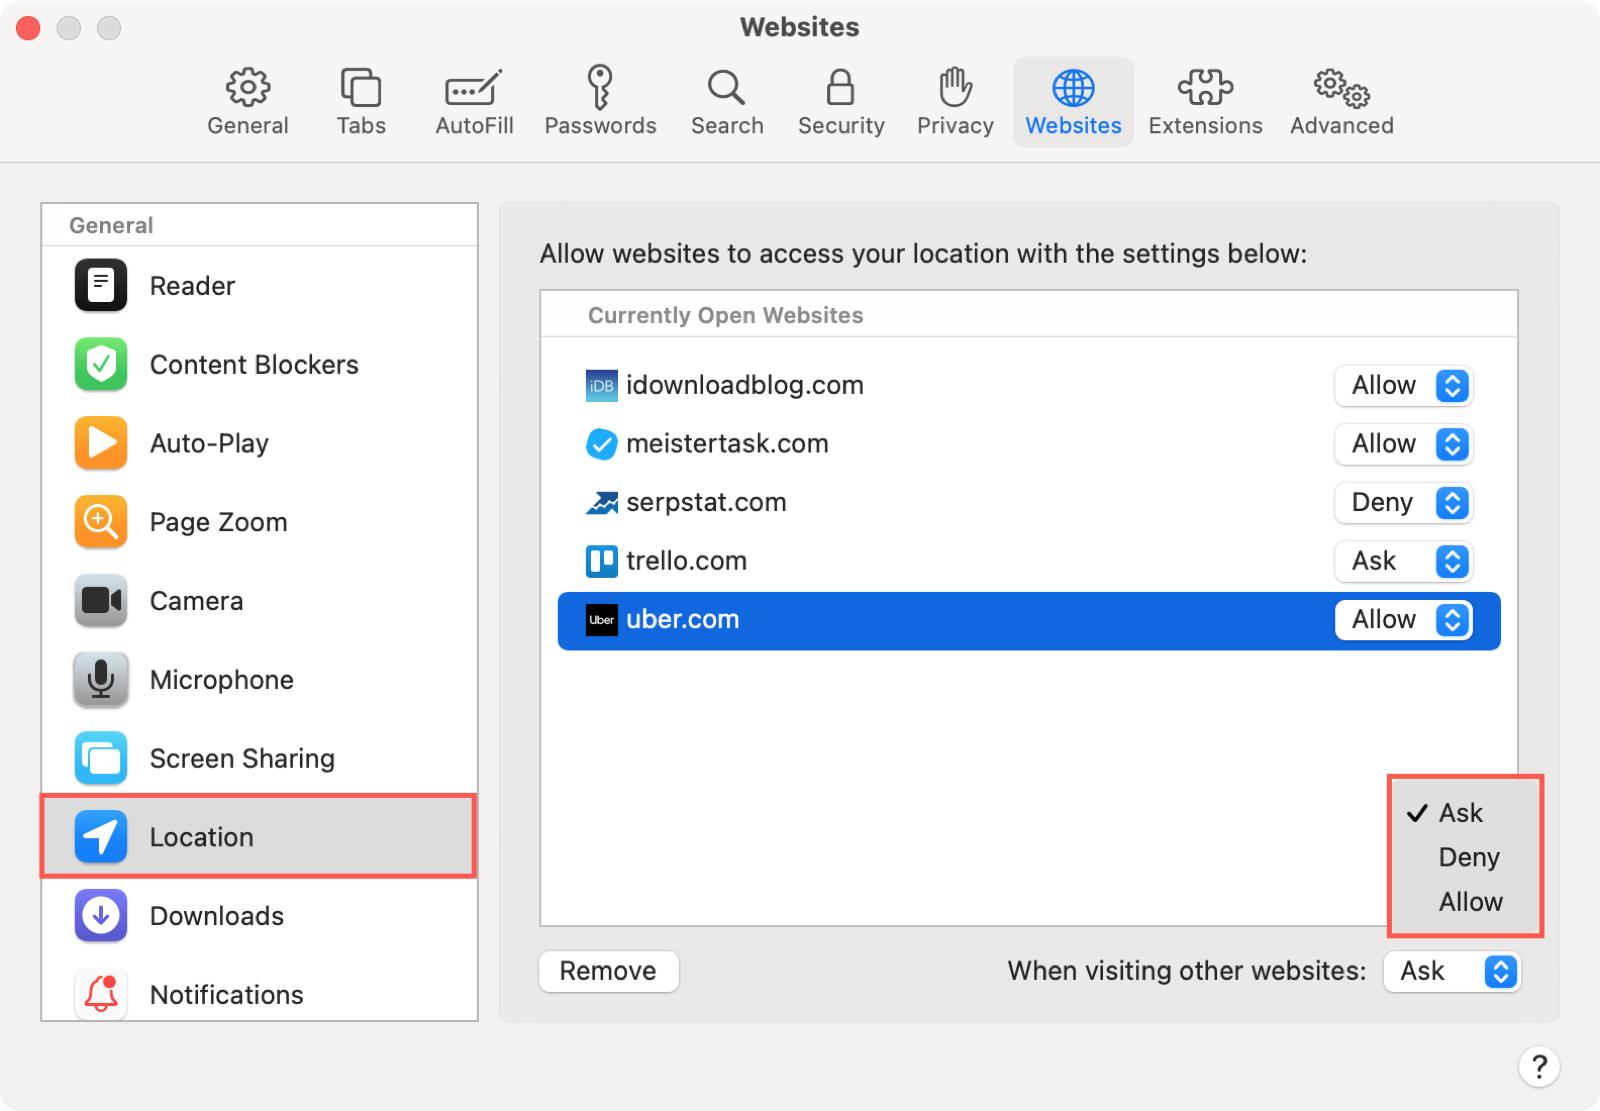 Safari Preferences Websites Location on Mac